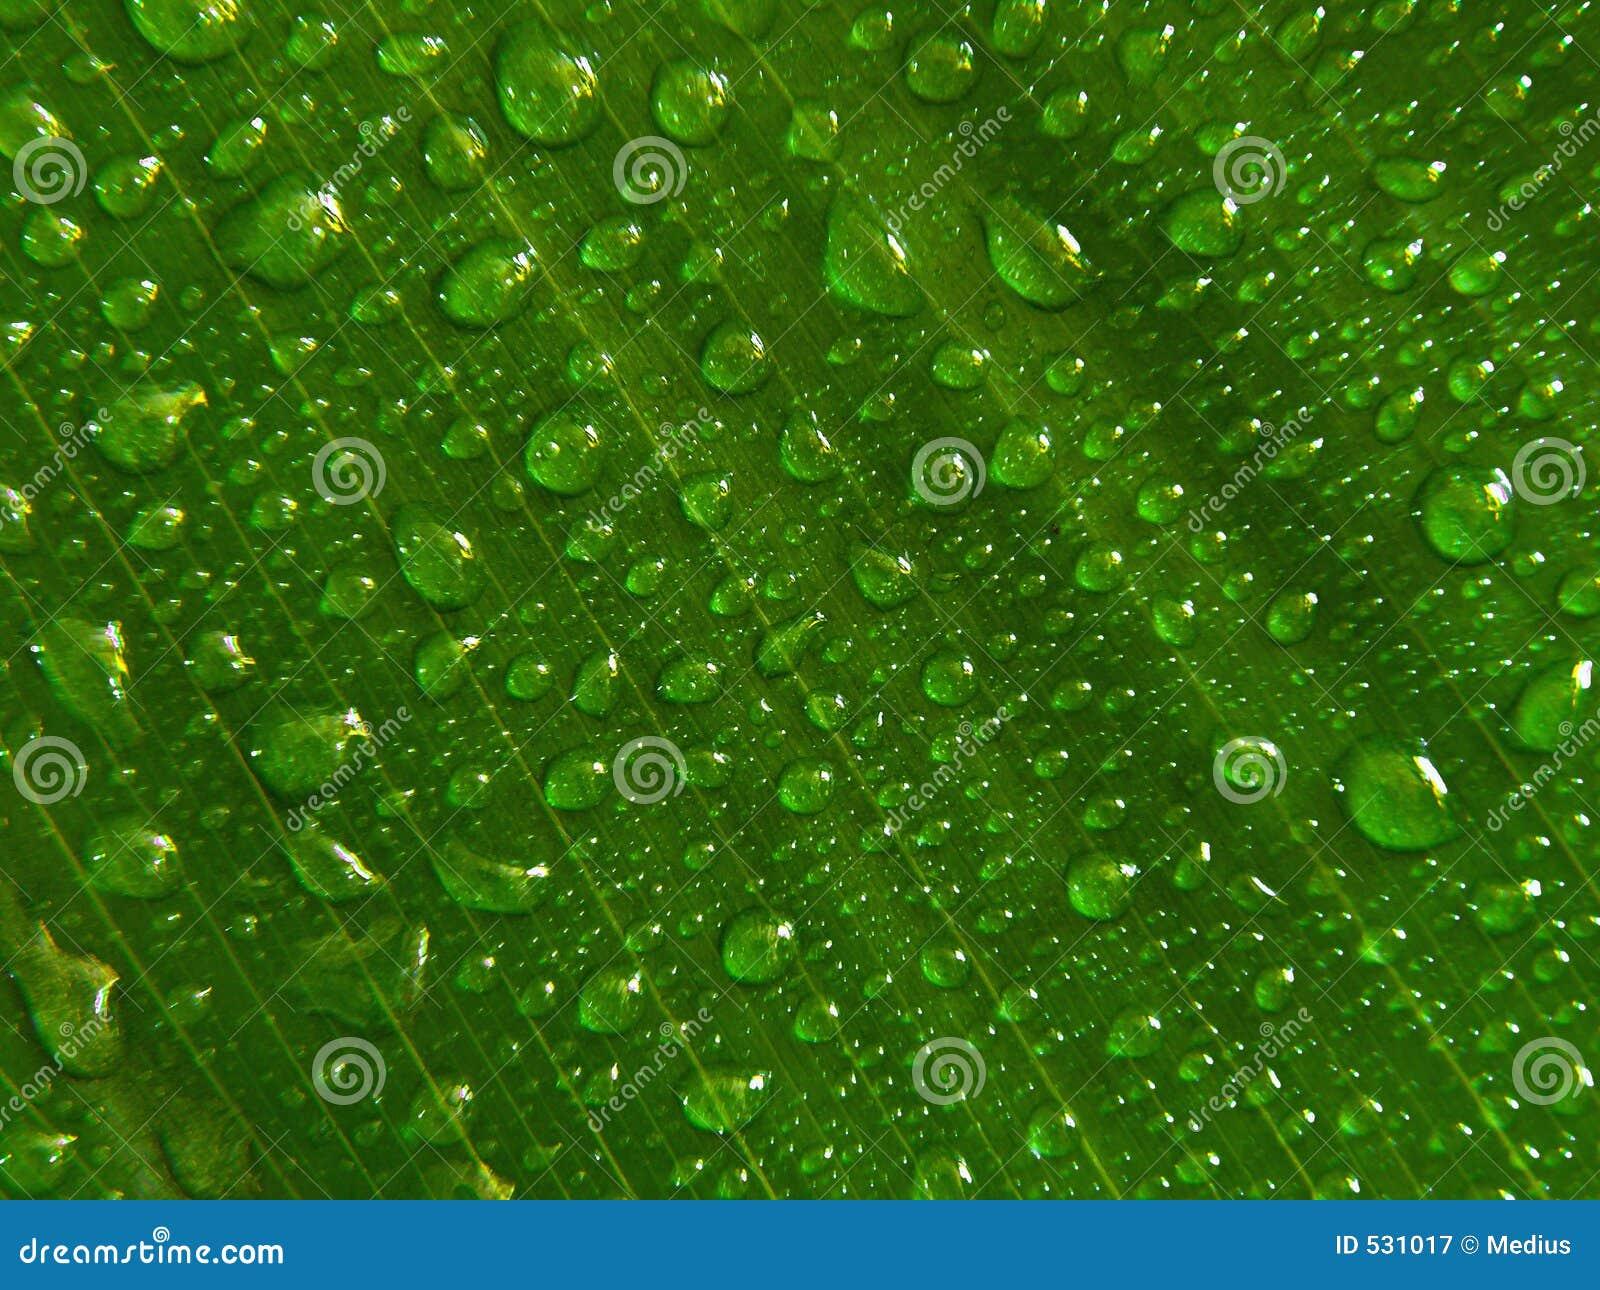 Download 小滴绿色叶子水 库存图片. 图片 包括有 湿气, 关闭, 戏弄, 特写镜头, 新鲜, 本质, 背包, 对比, 下落 - 531017